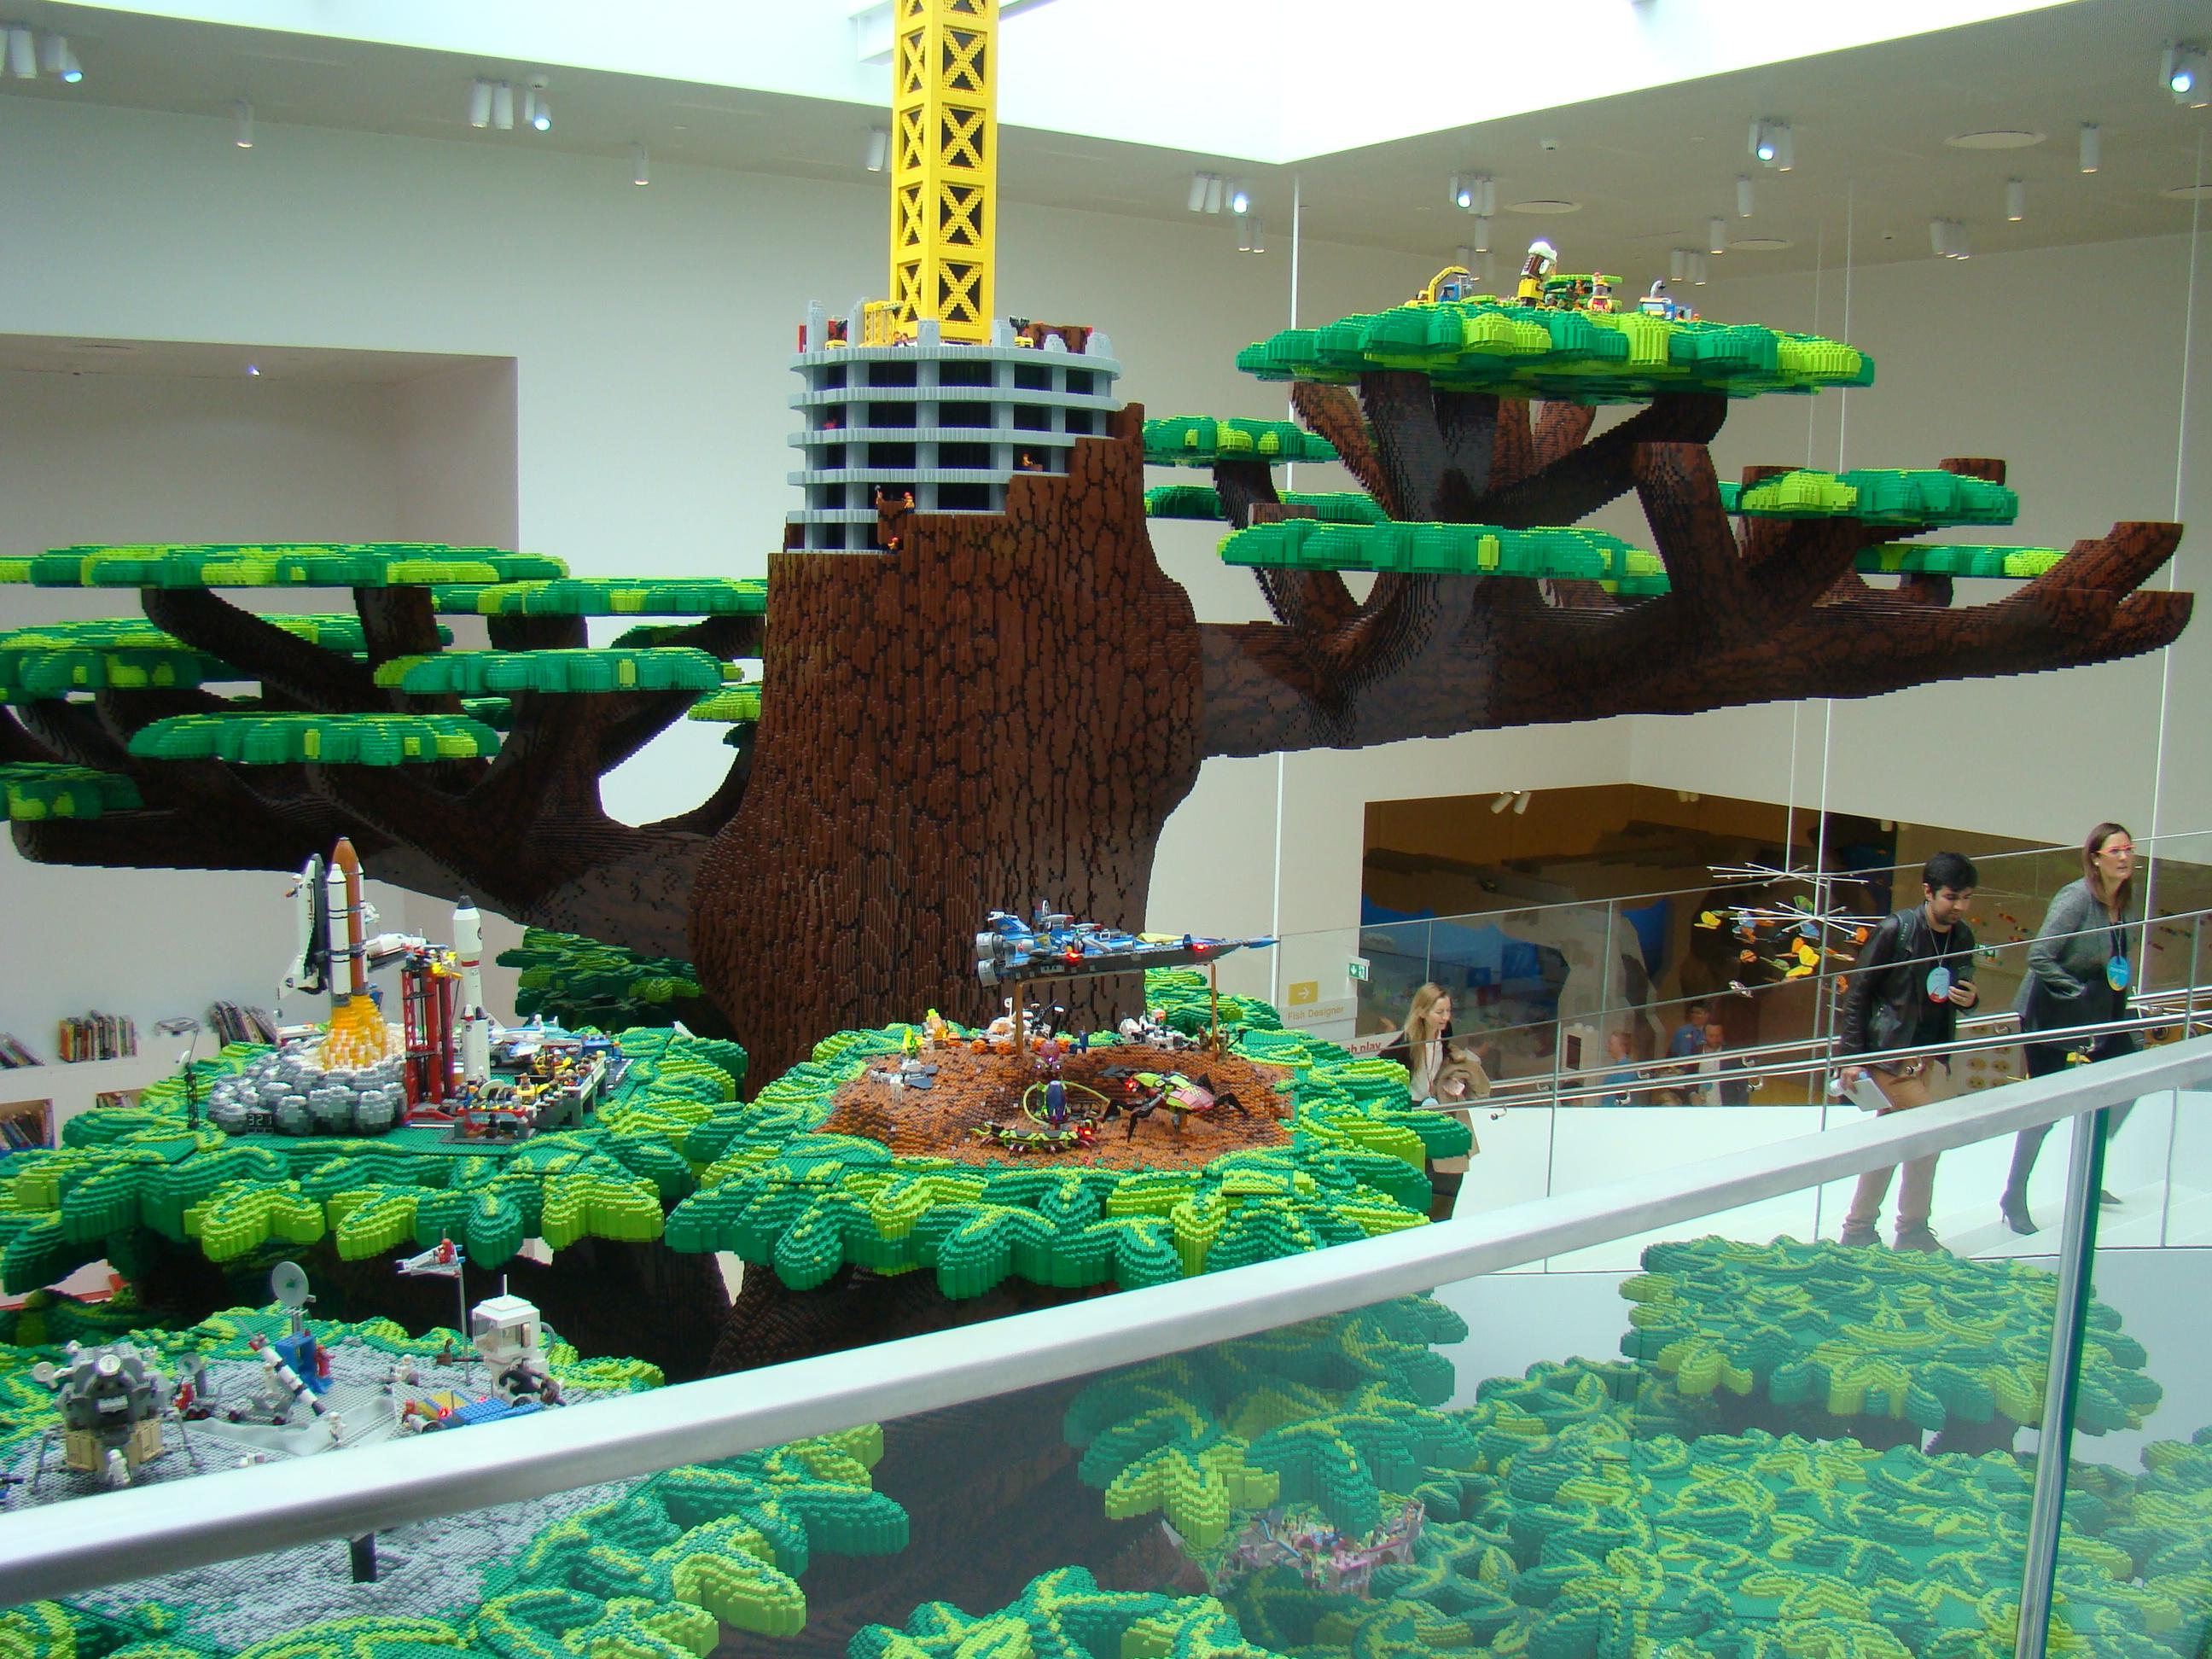 LEGO sculpture.